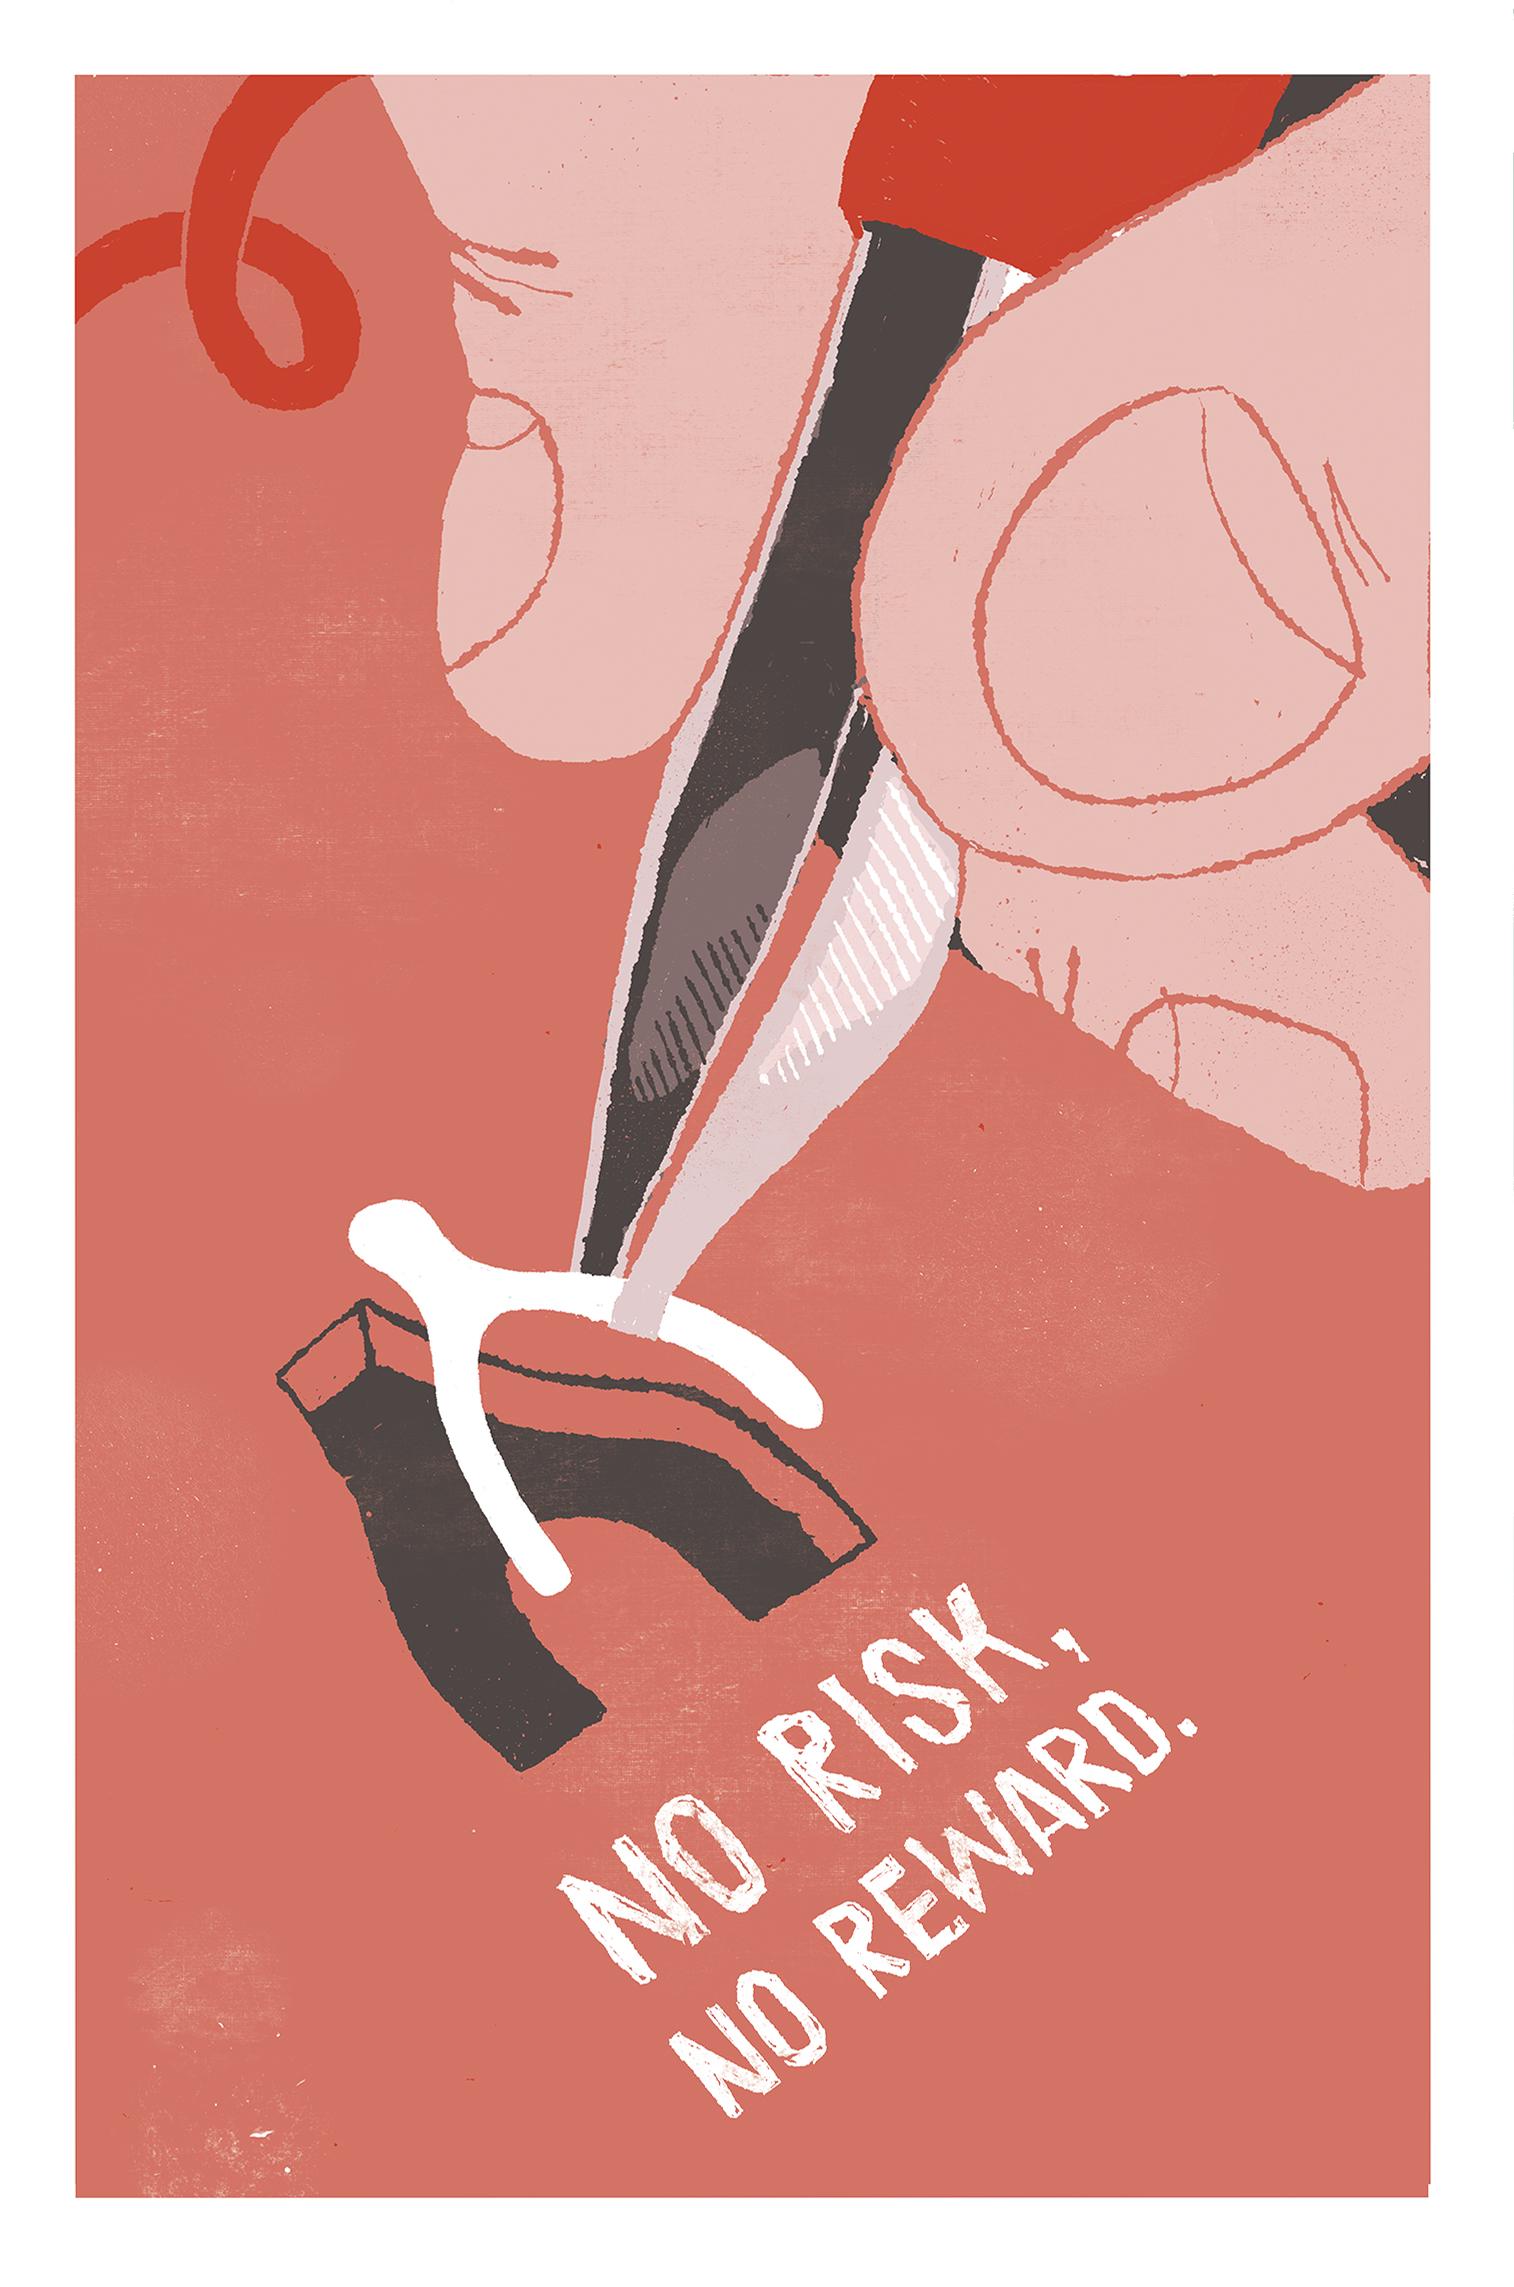 'No Risk, No Reward' poster by Nada Hayek